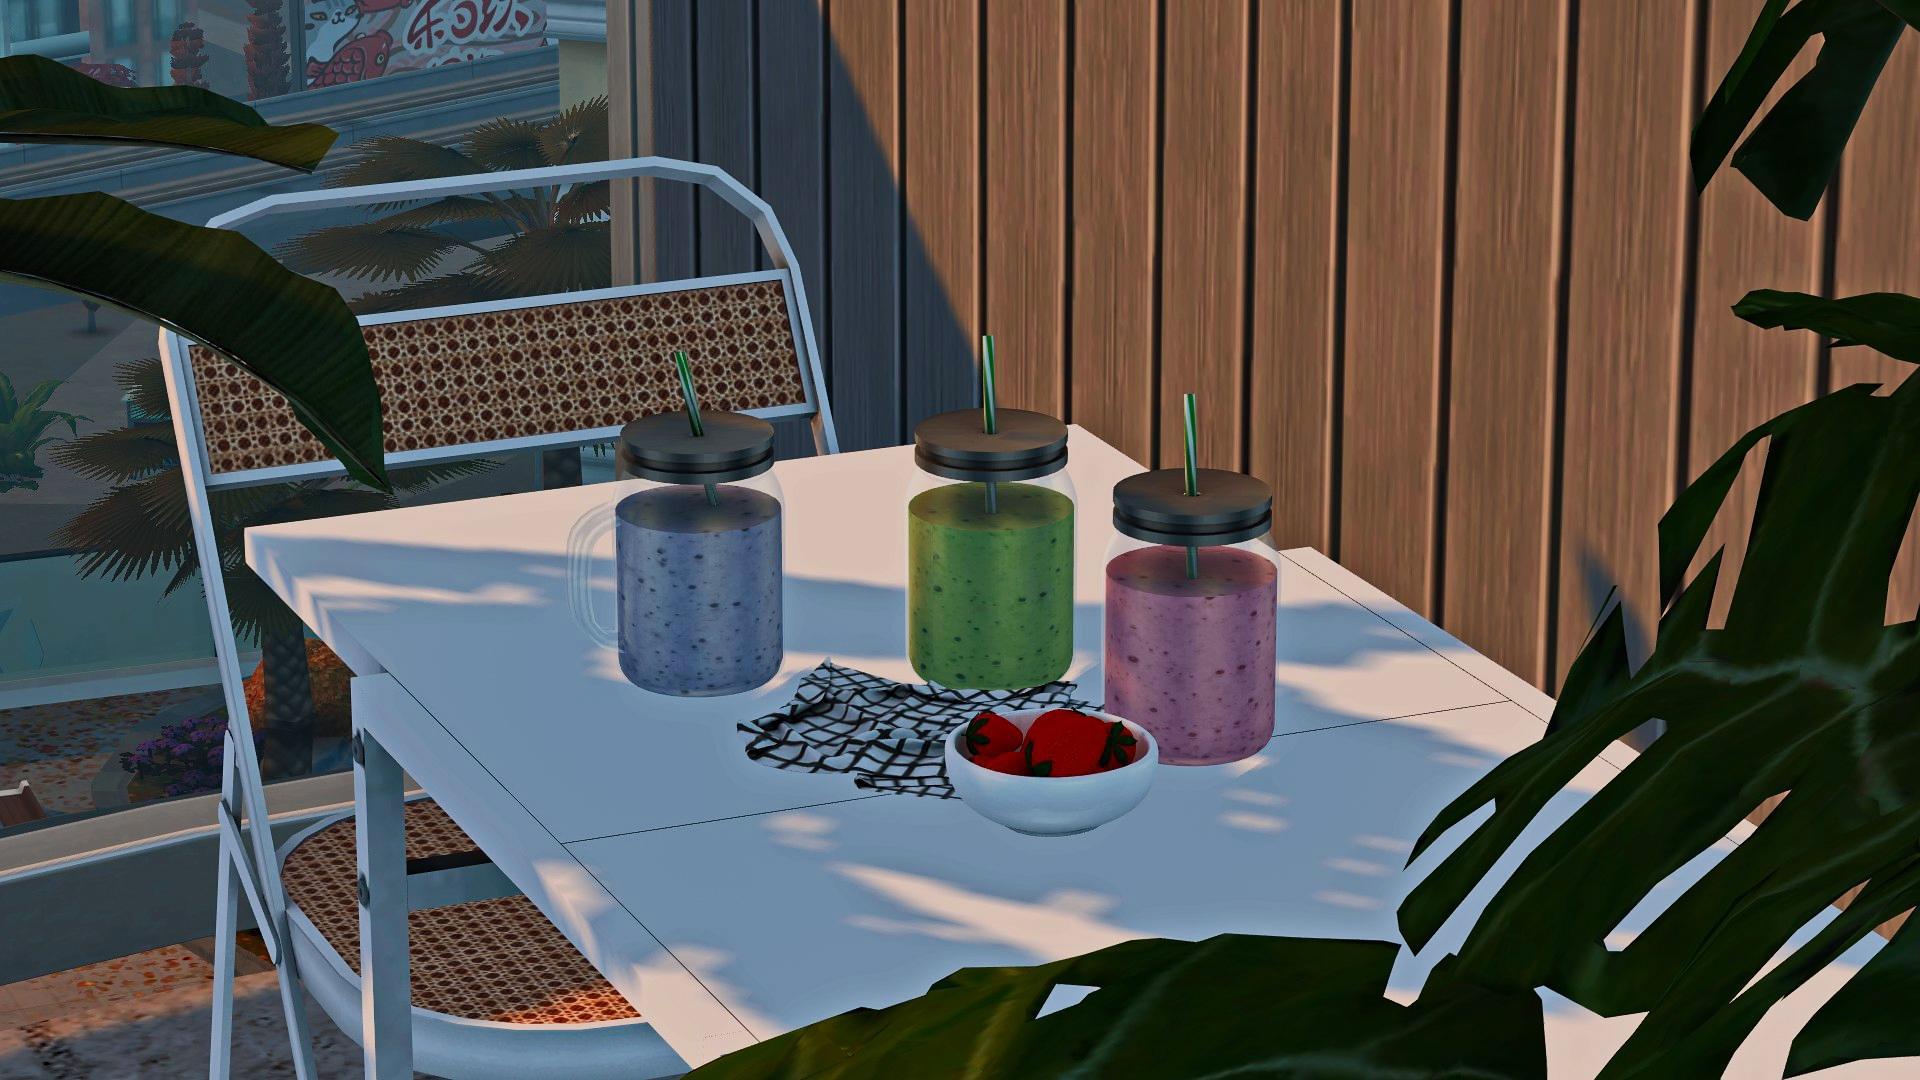 Mason Jar Smoothie, high quality sims 4 cc, sunkissedlilacs, free sims 4 furniture, sims 4 custom content,